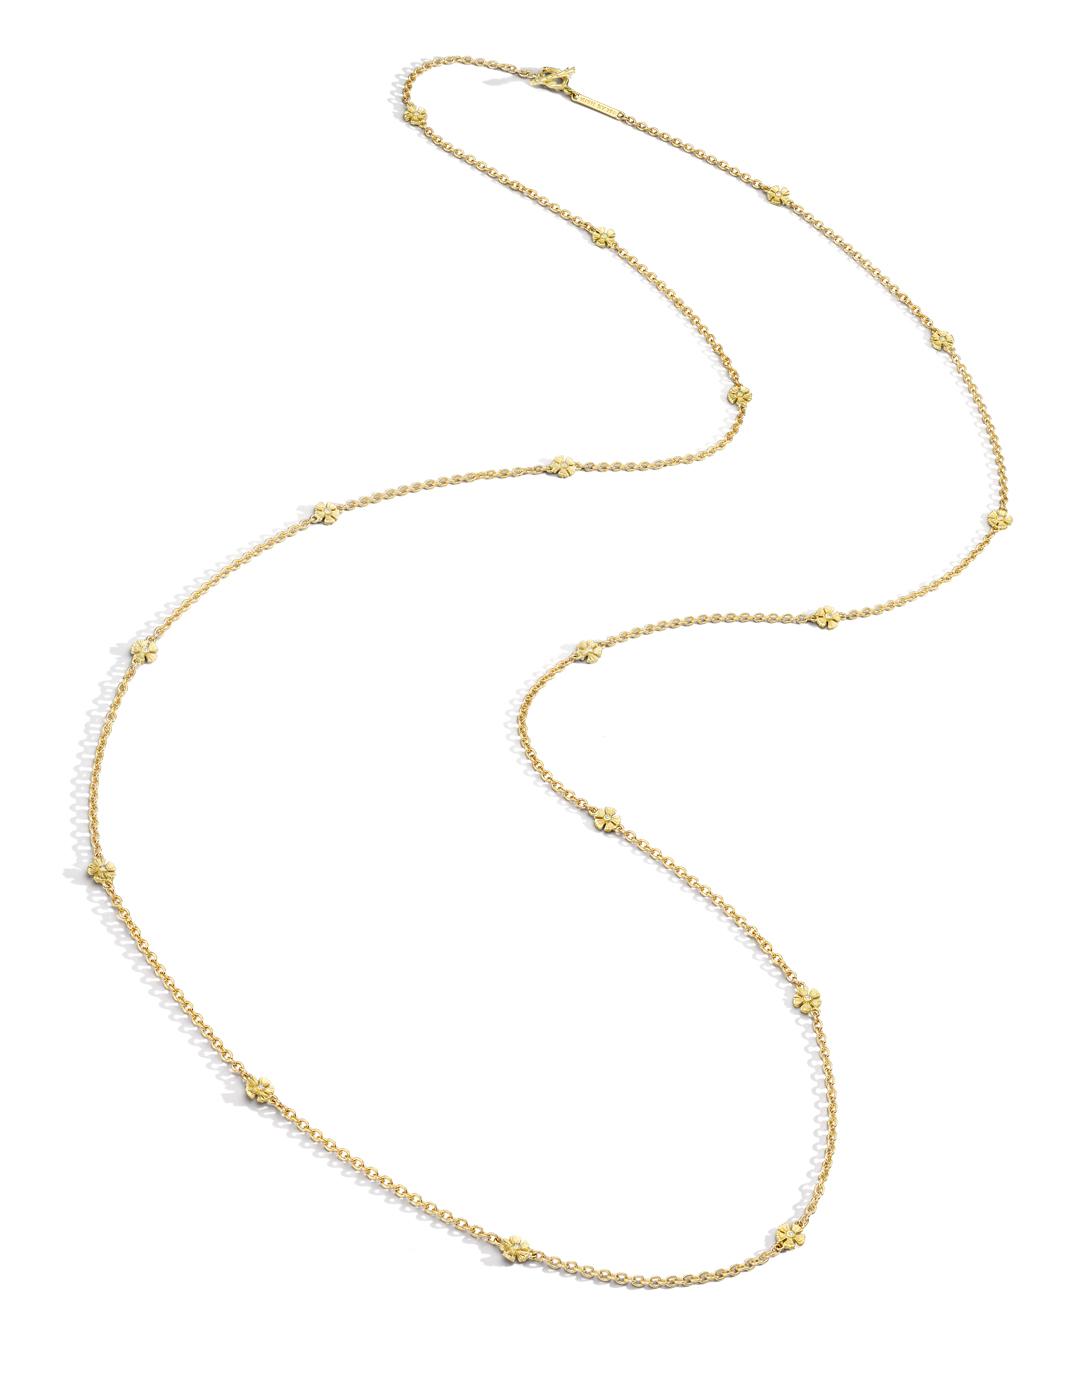 mish_necklaces_StrawFlwr-Tiny Station-NK-1